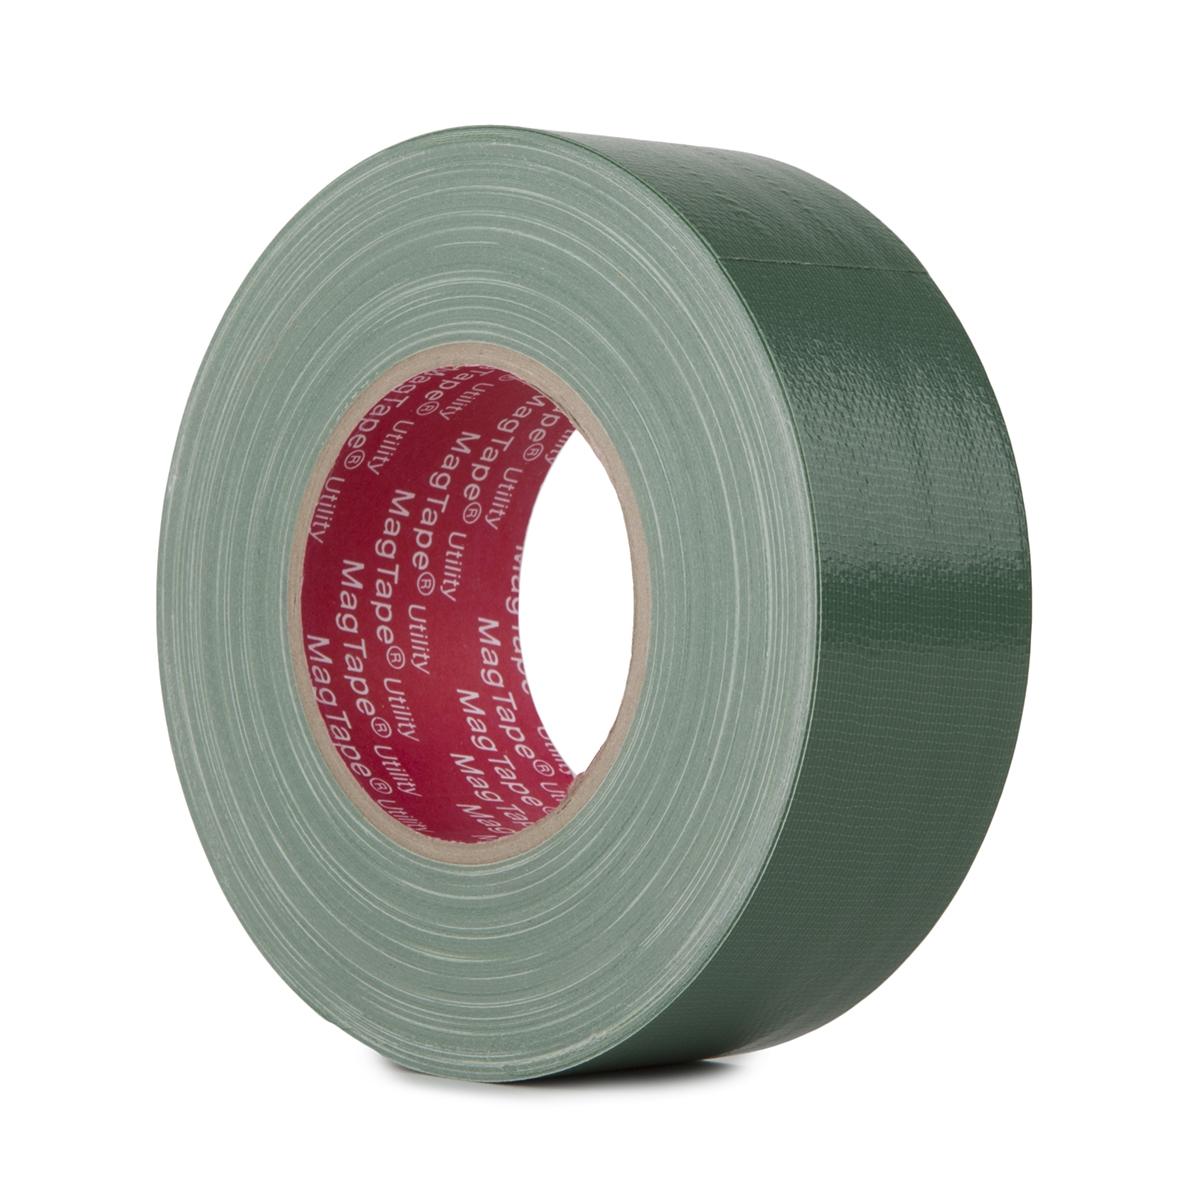 MagTape Utility gaffa tape 50mm x 50m groen